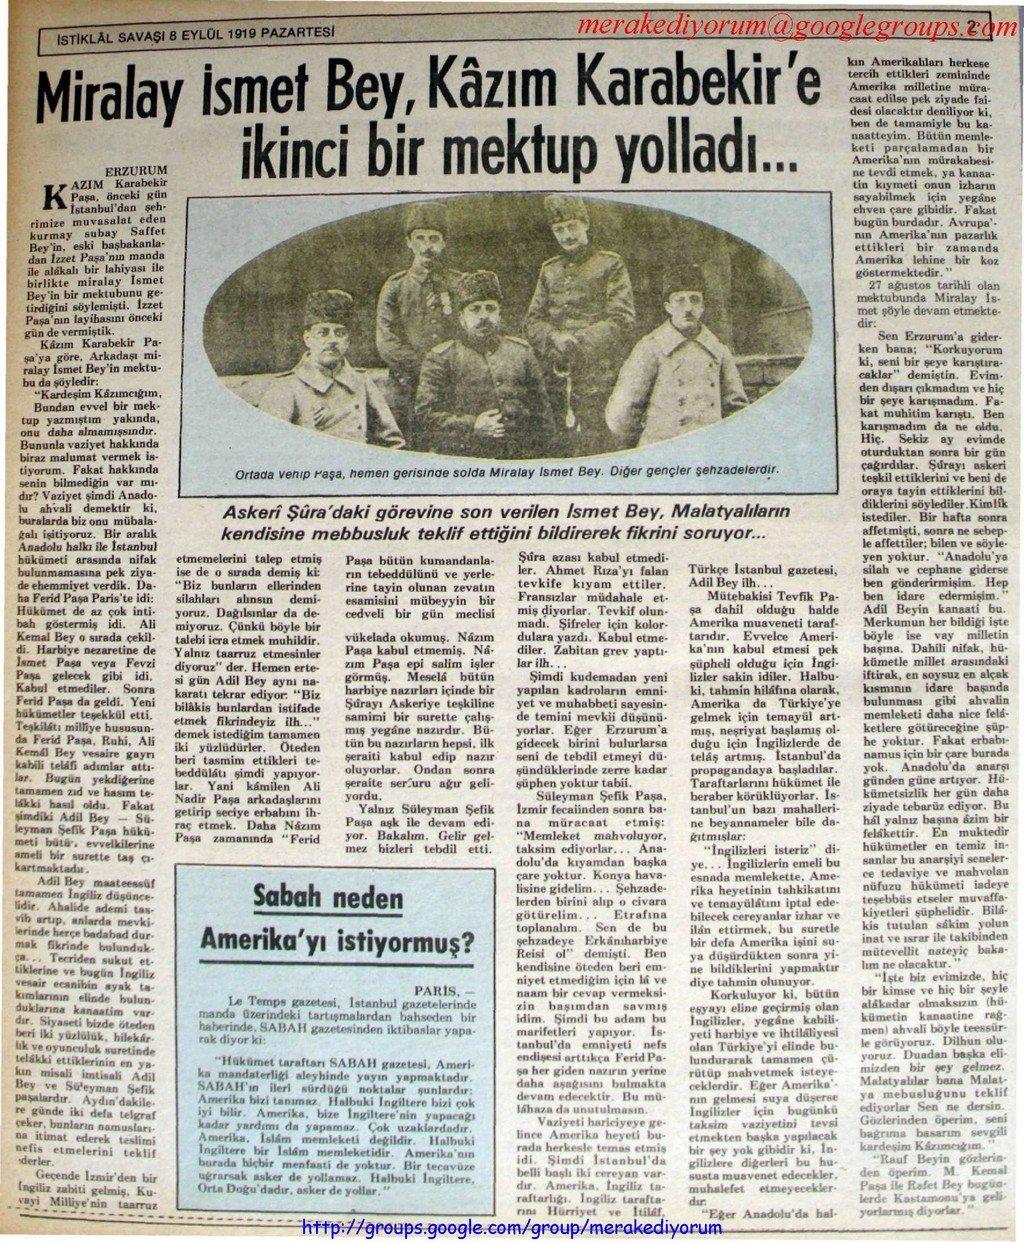 istiklal savaşı gazetesi - 8 eylül 1919